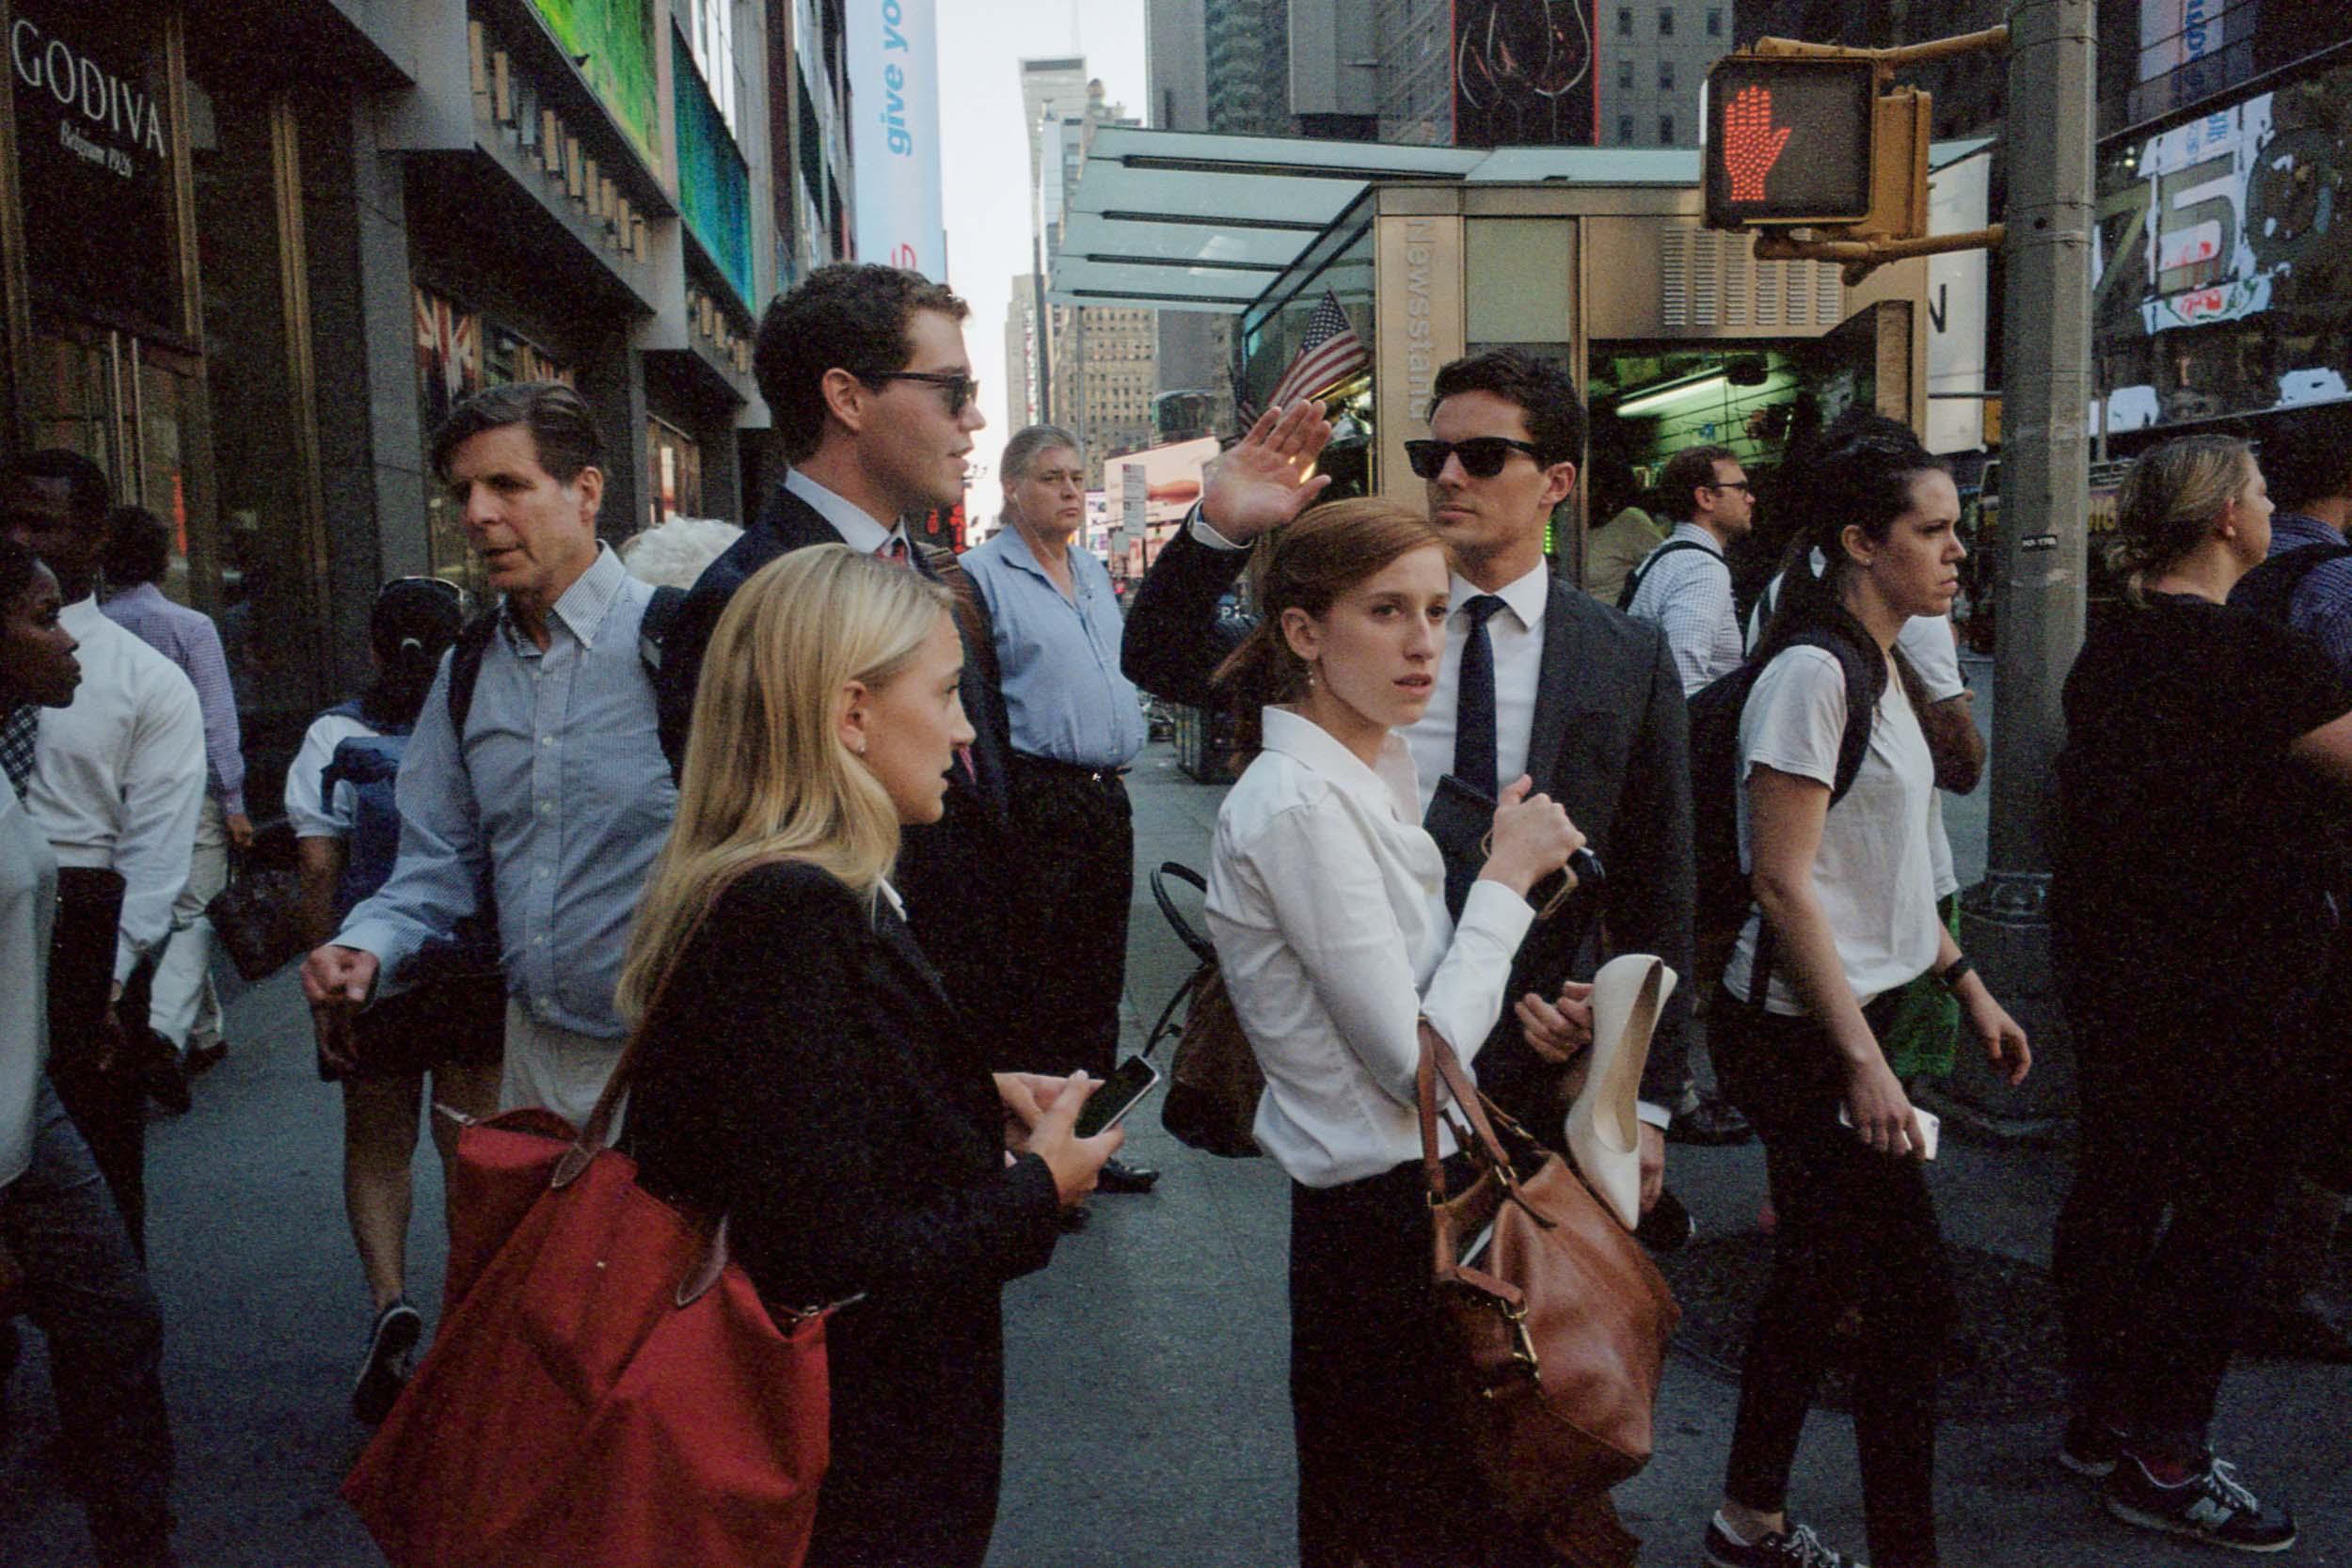 new-york-city-street-photography-Sebastian-Siadecki-10